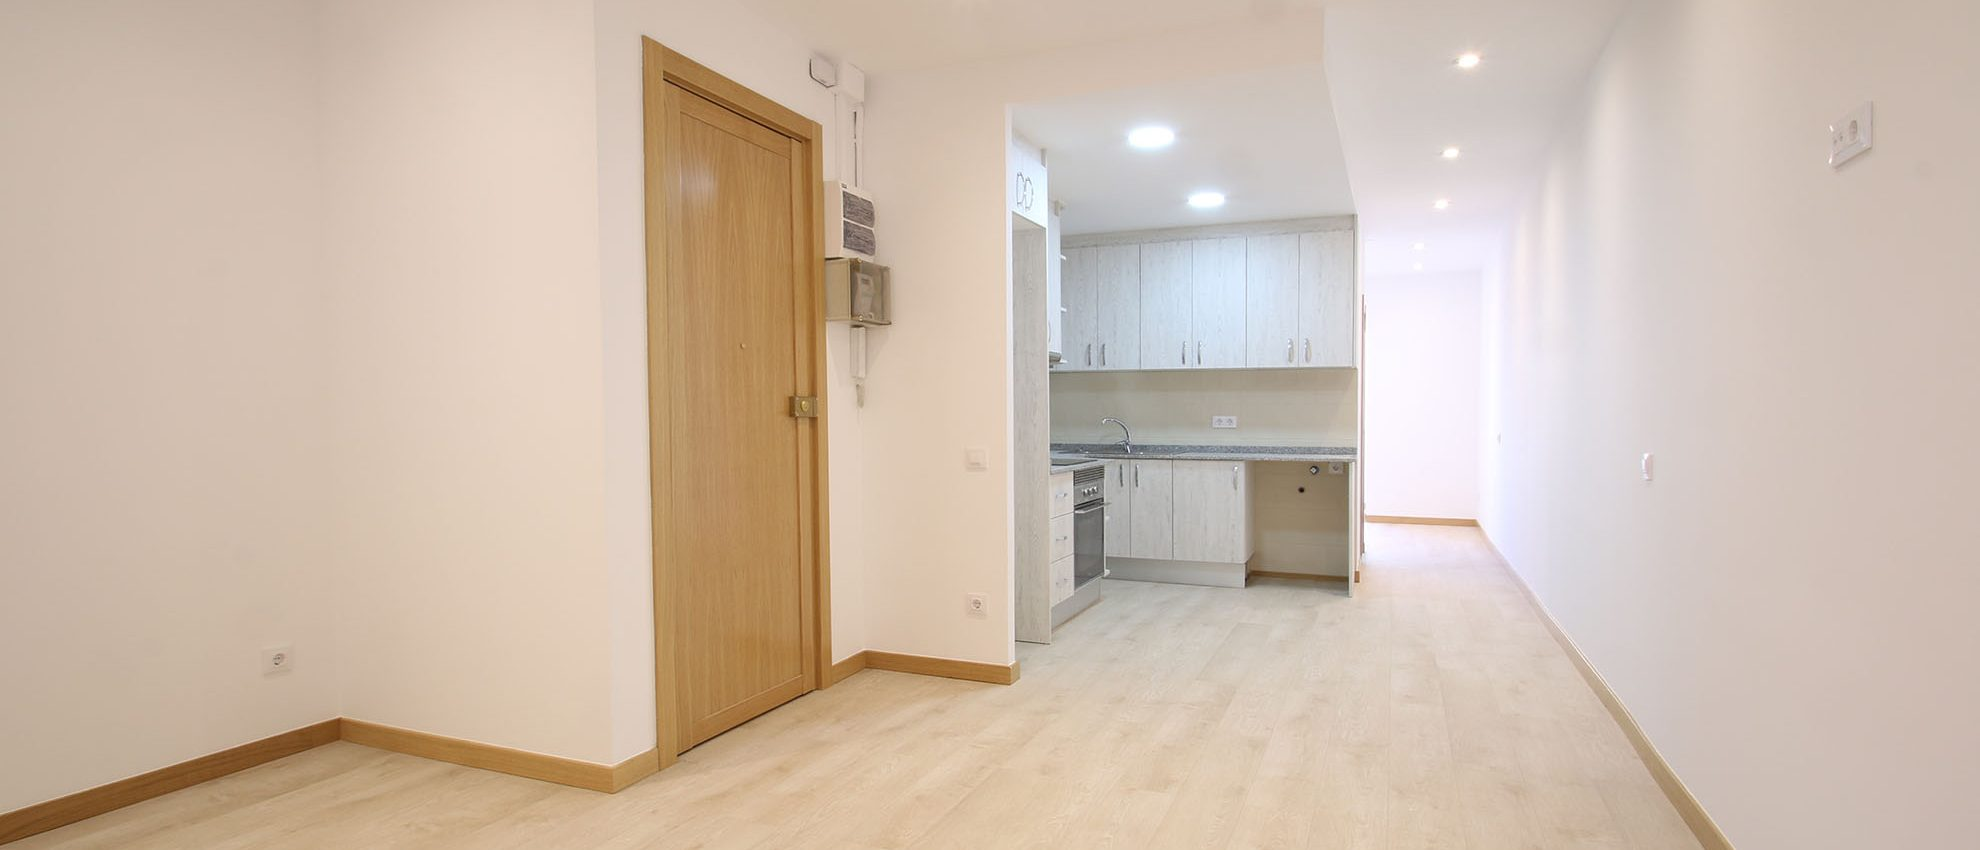 Bailèn 2 apartment